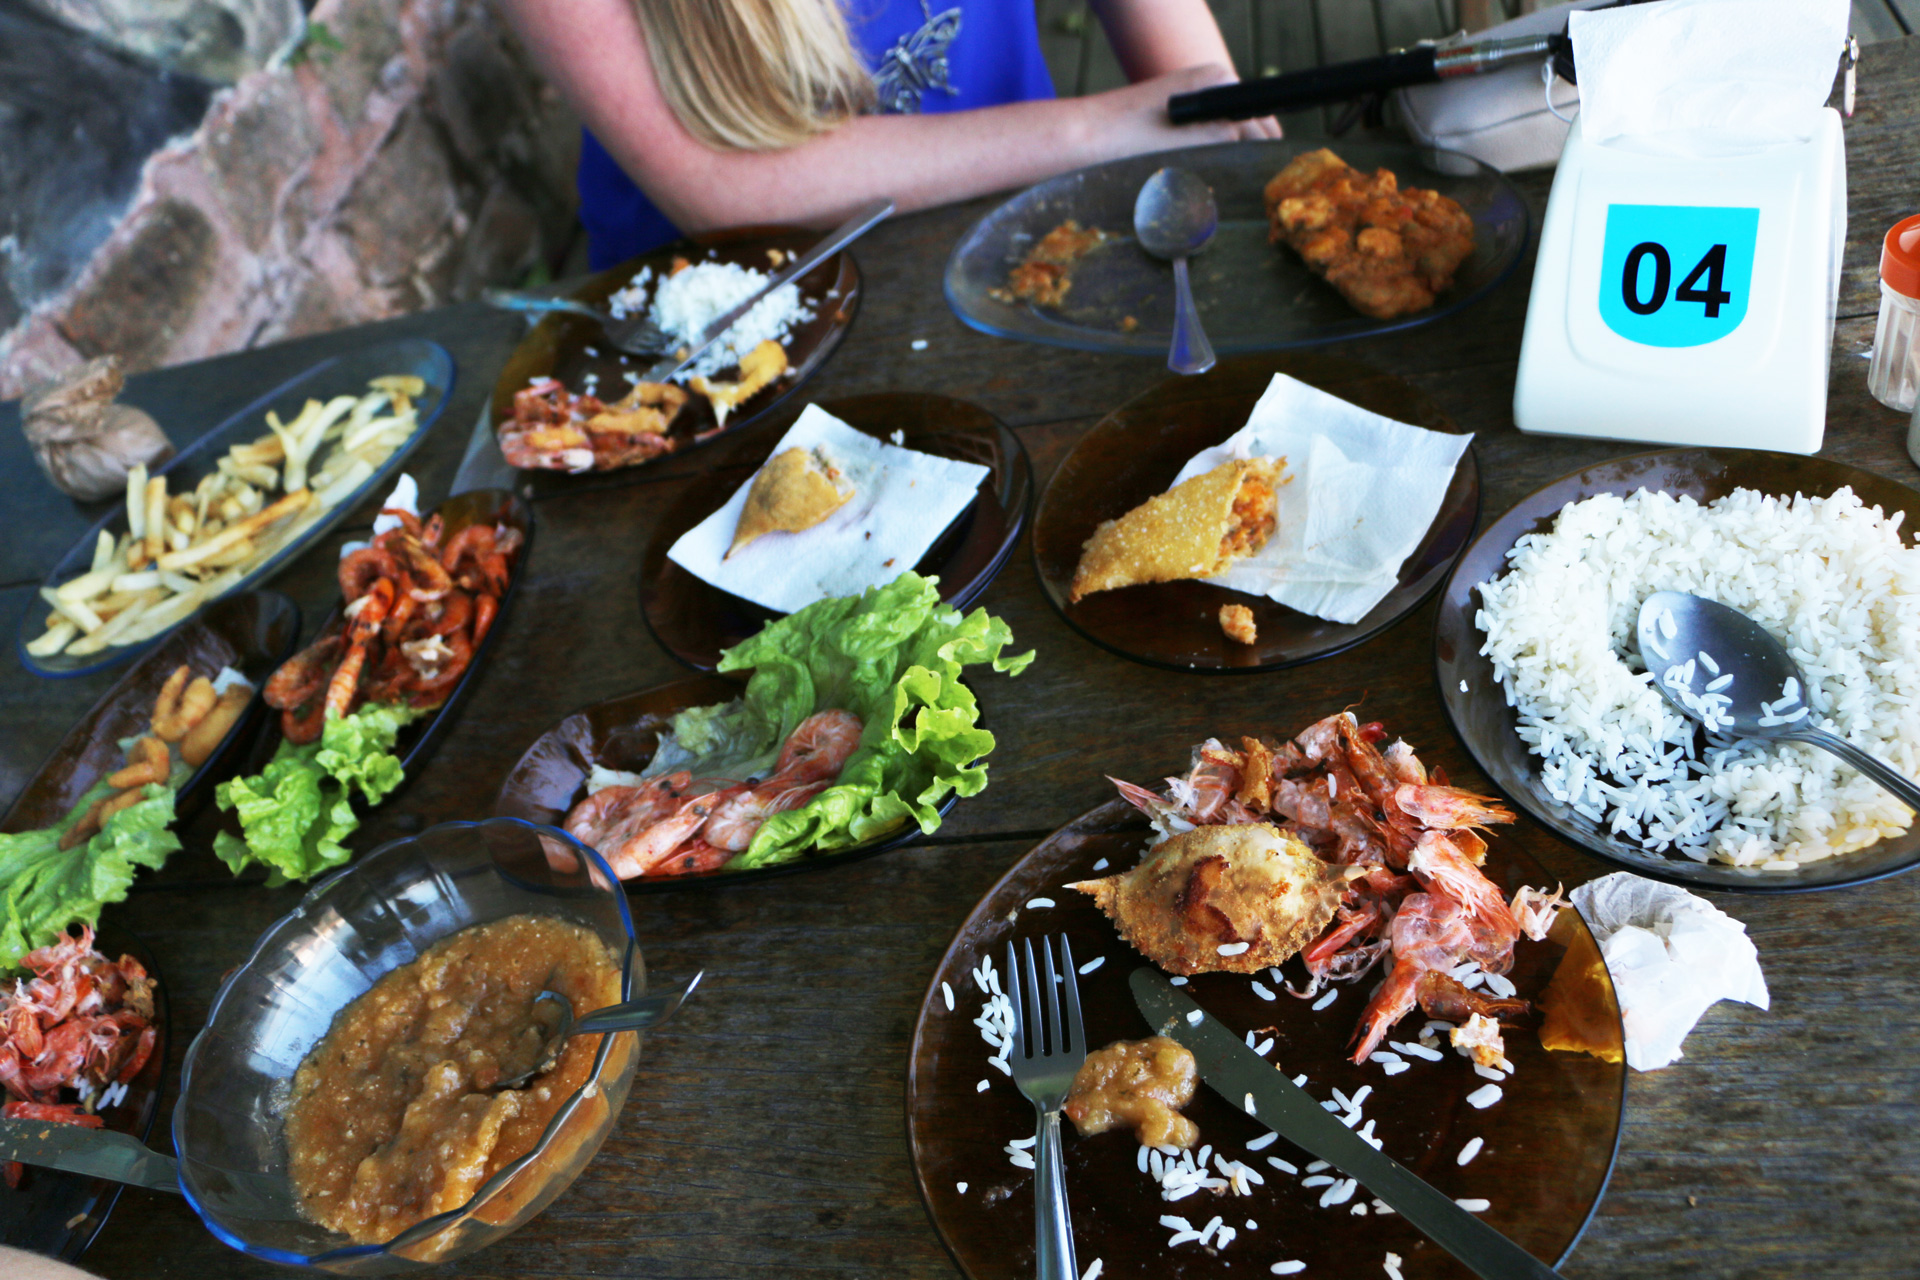 shrimp-meal-lagoa-florianopolis